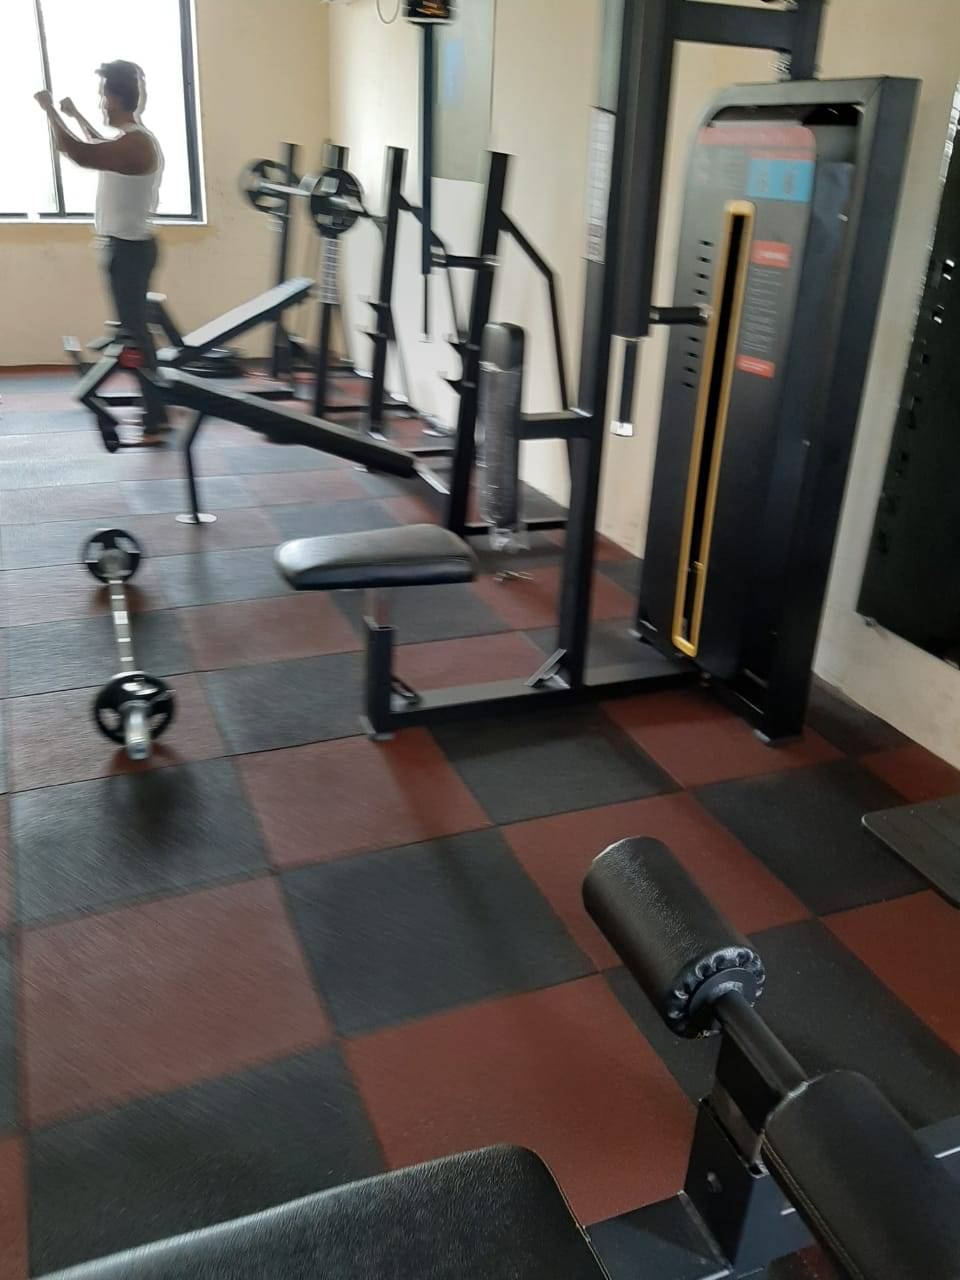 Valsad-Garib-Nawaz-Society-DFC-Decent-Fitness-Centre_384_Mzg0_MTIxMw